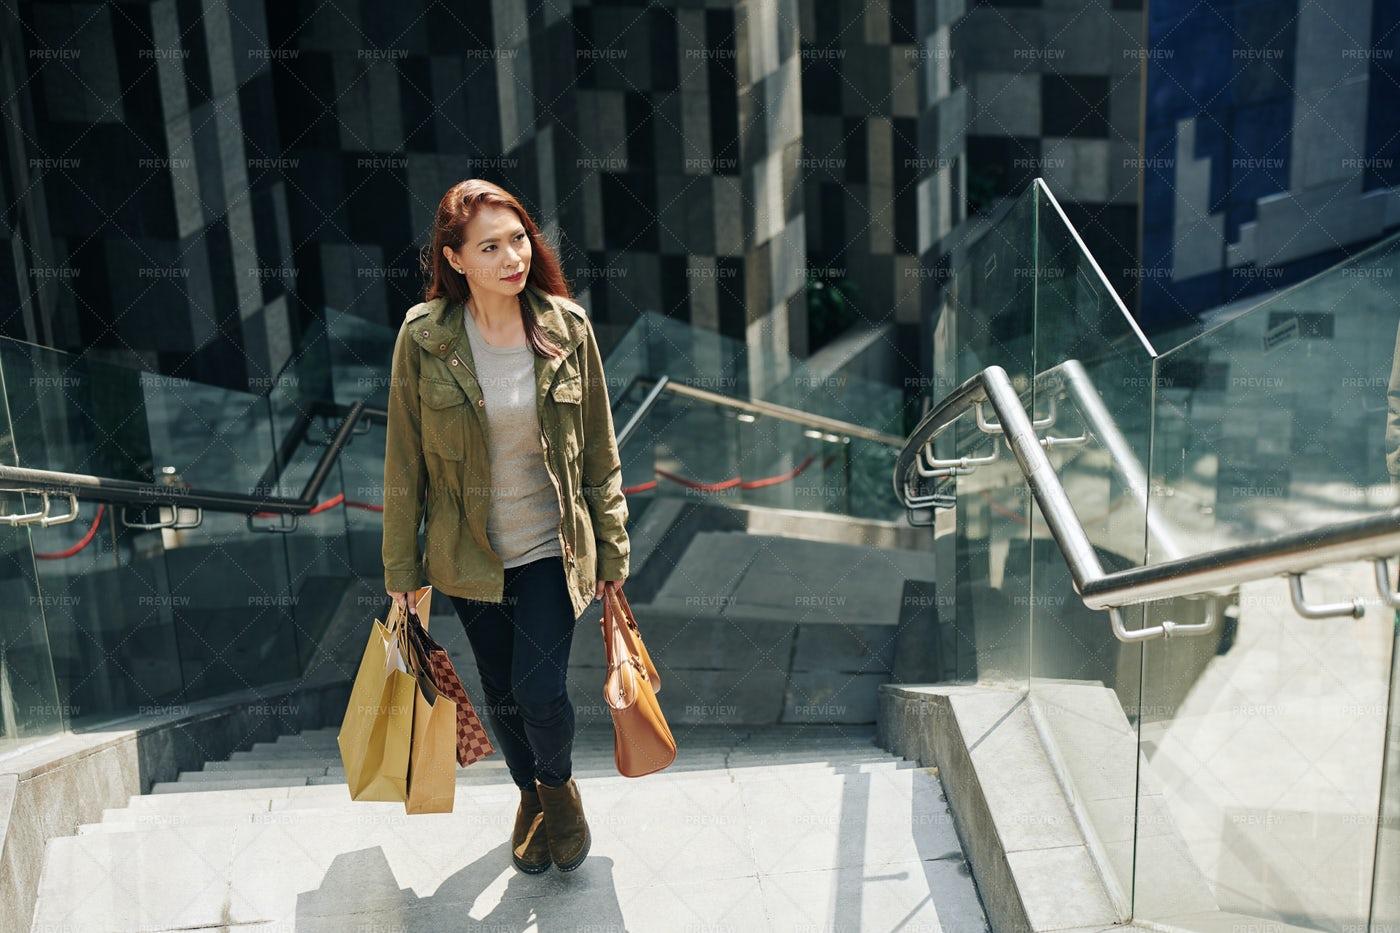 Woman Carrying Shopping Bags: Stock Photos